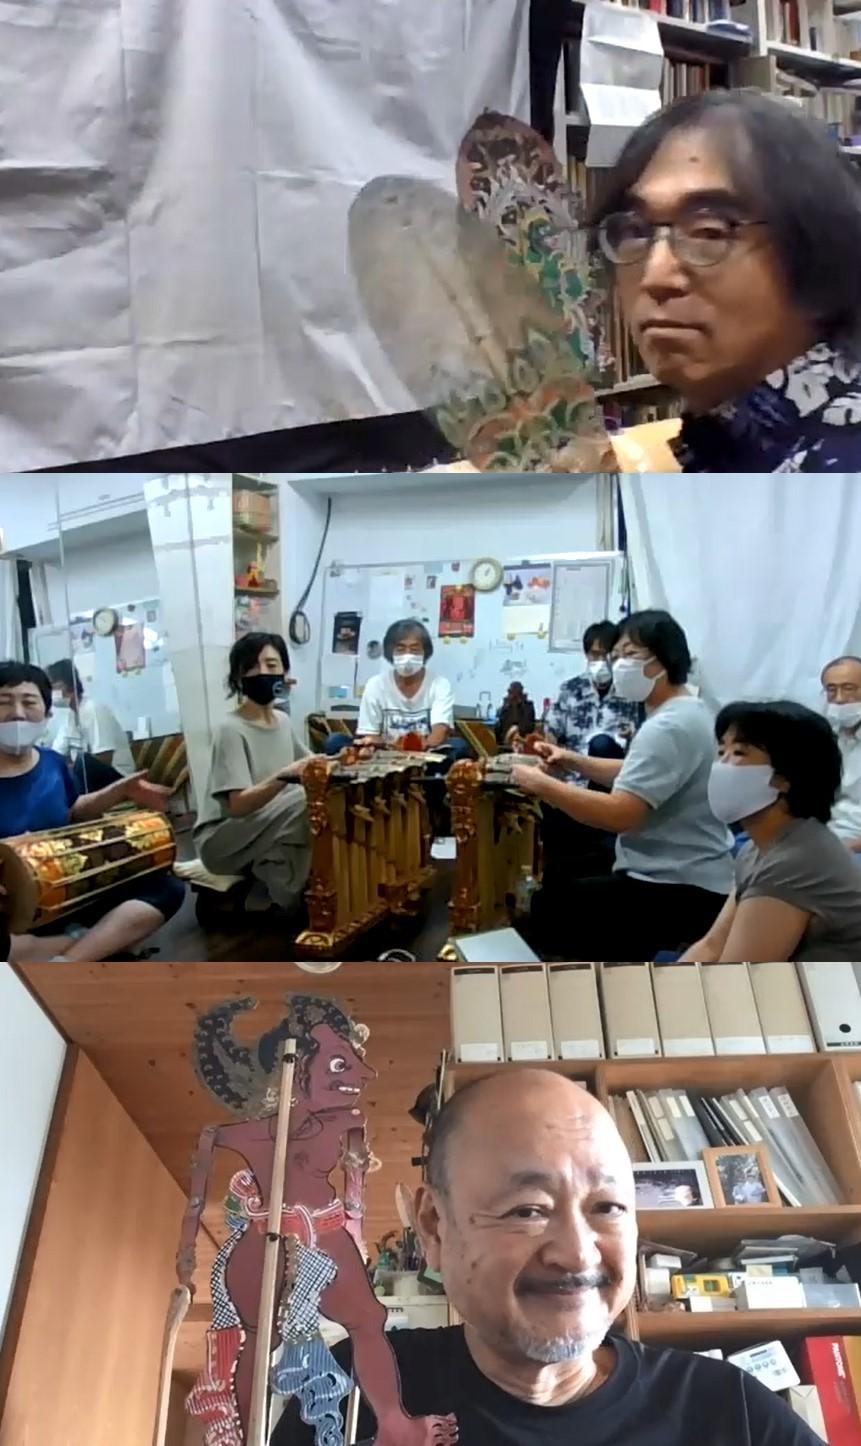 浜松市楽器博物館での影絵芝居公演_e0017689_20490364.jpg